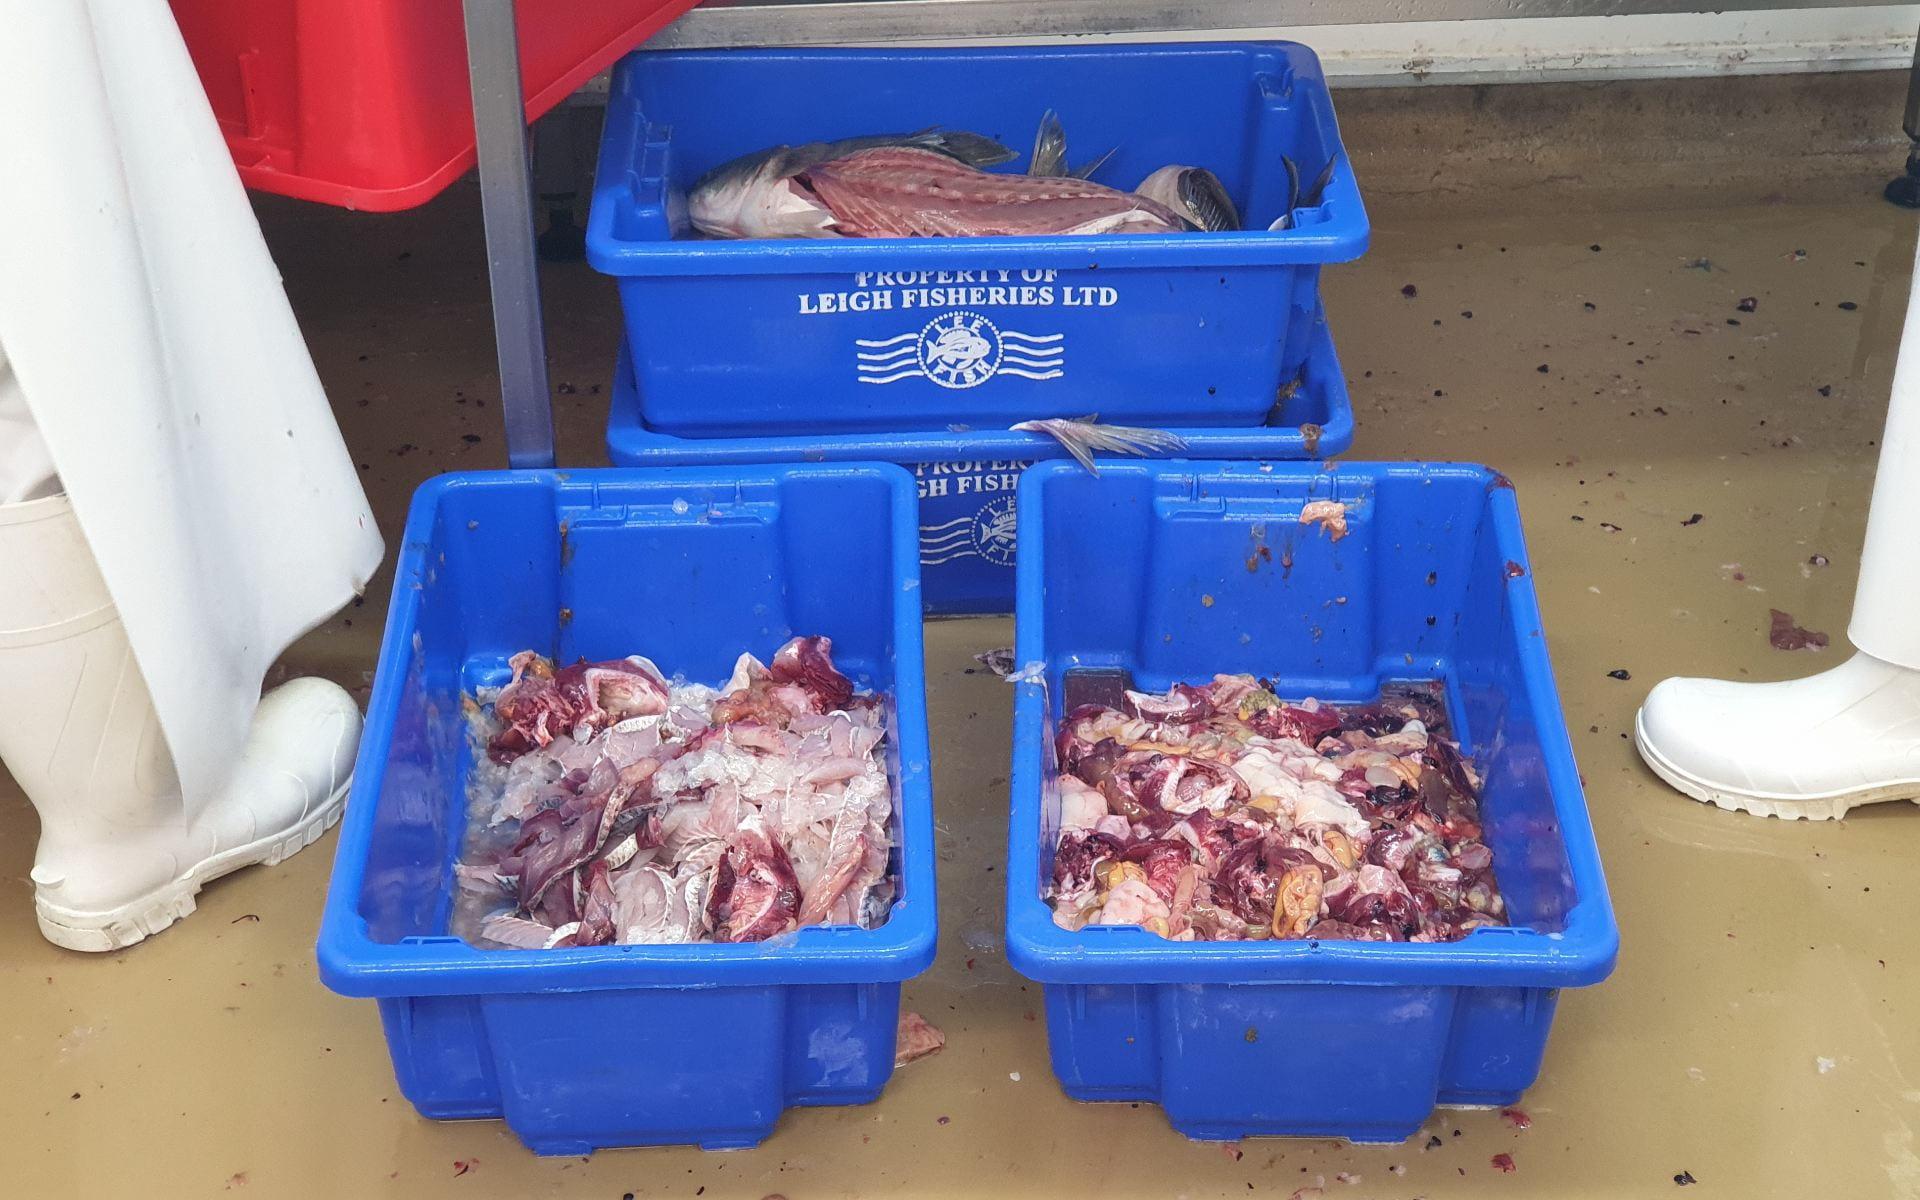 Fish off-cuts in blue bins